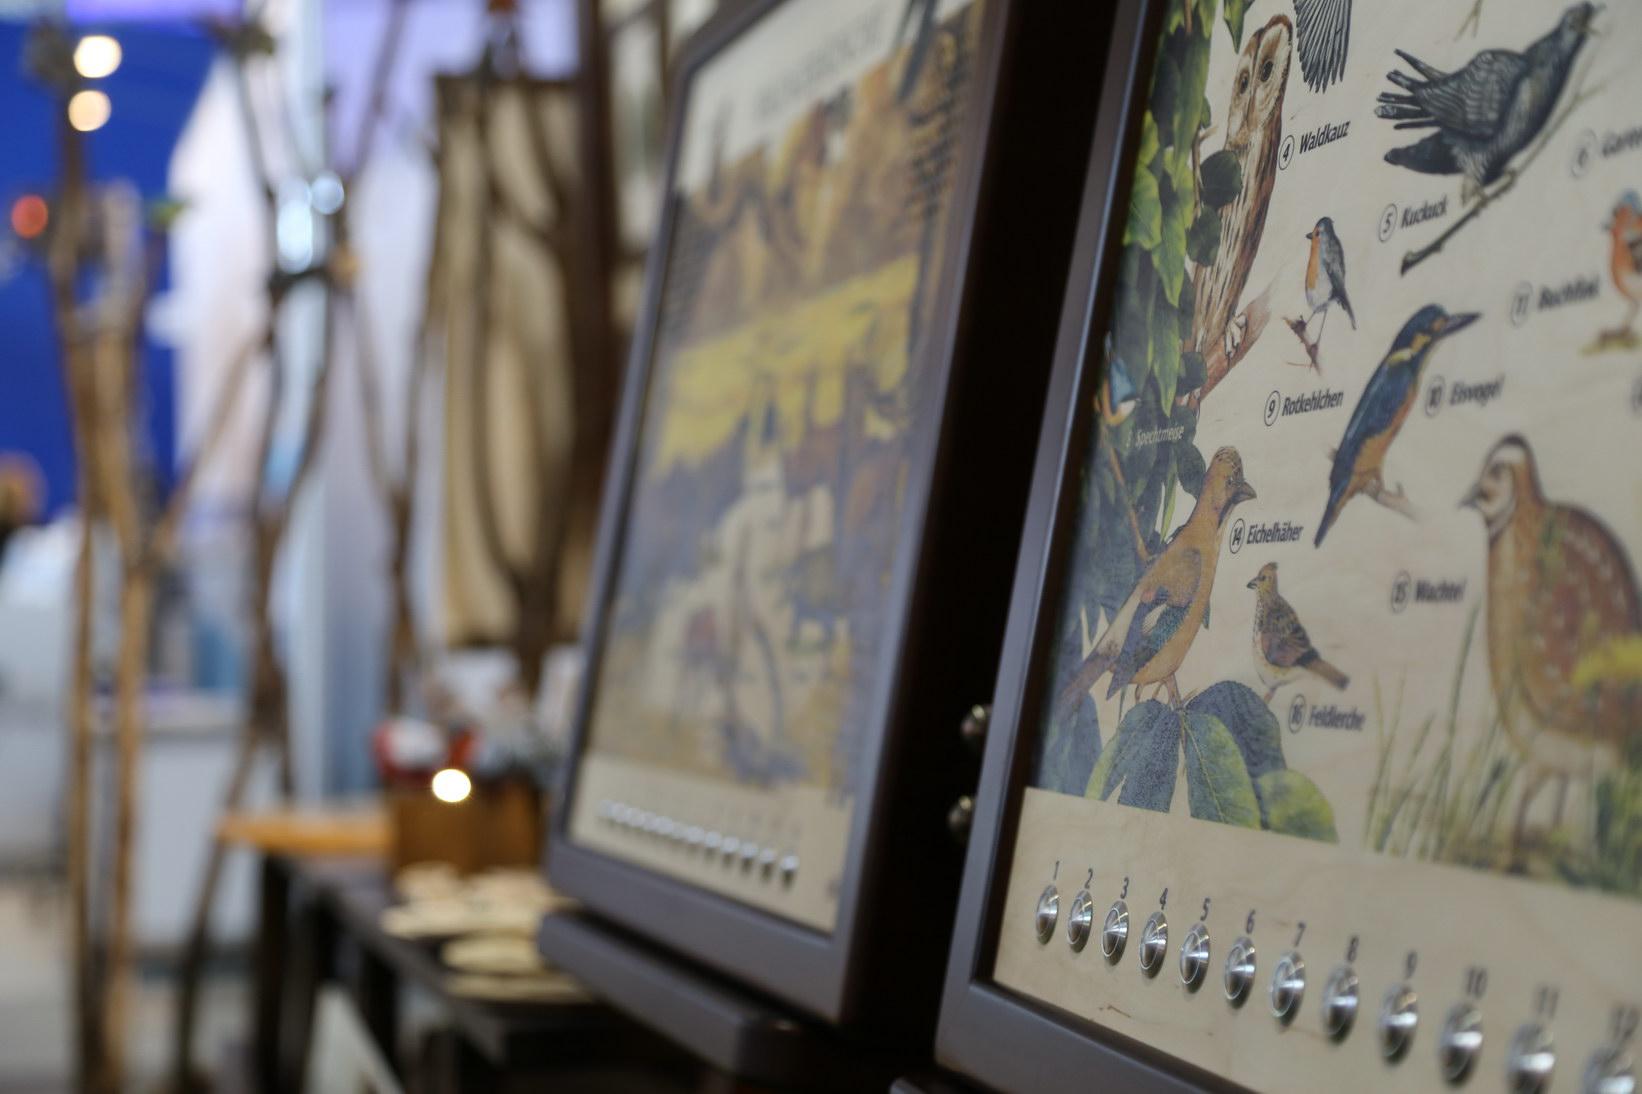 Puls-Art - tablice edukacyjne, ścieżki przyrodnicze, izby edukacyjne, izby przyrodnicze